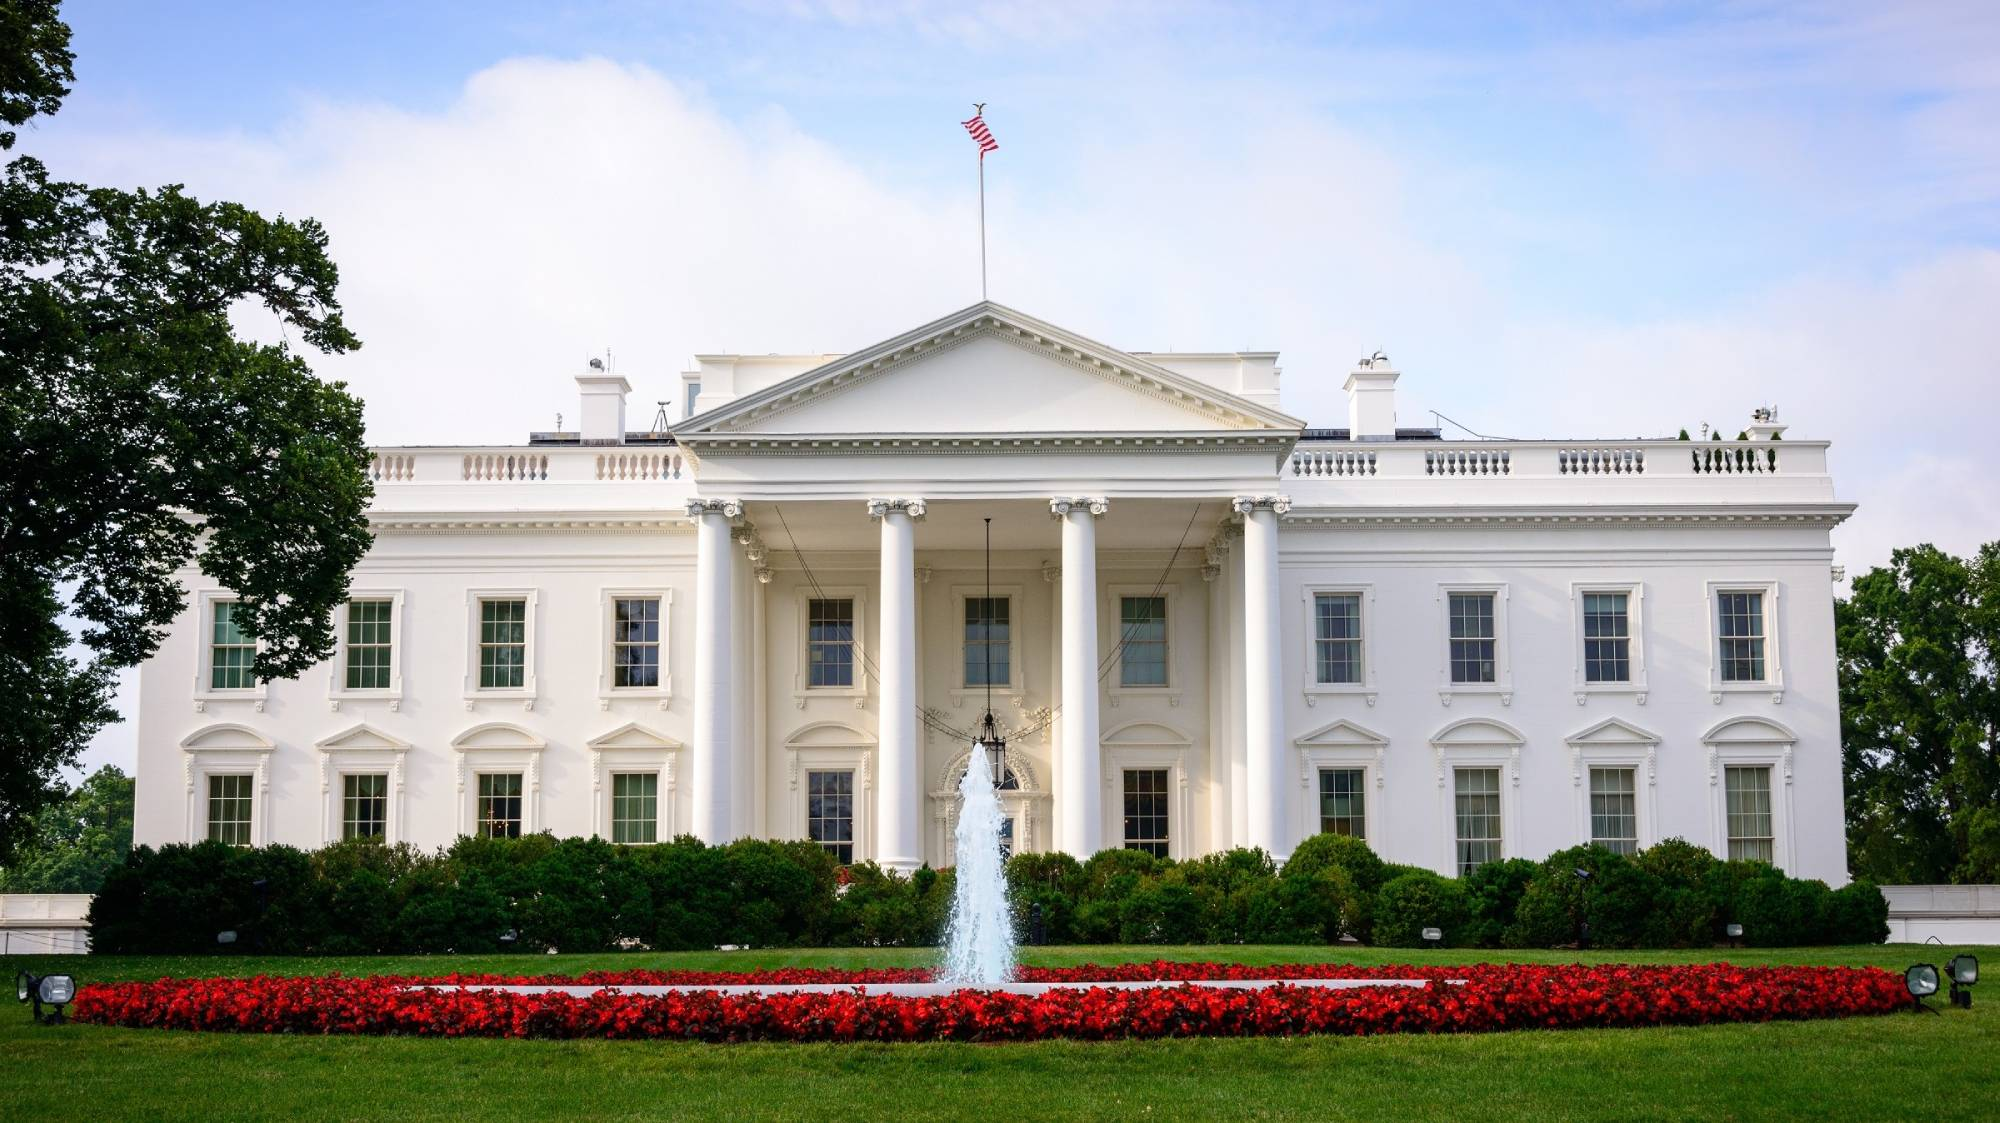 Washington, D.C. - Travel Blog